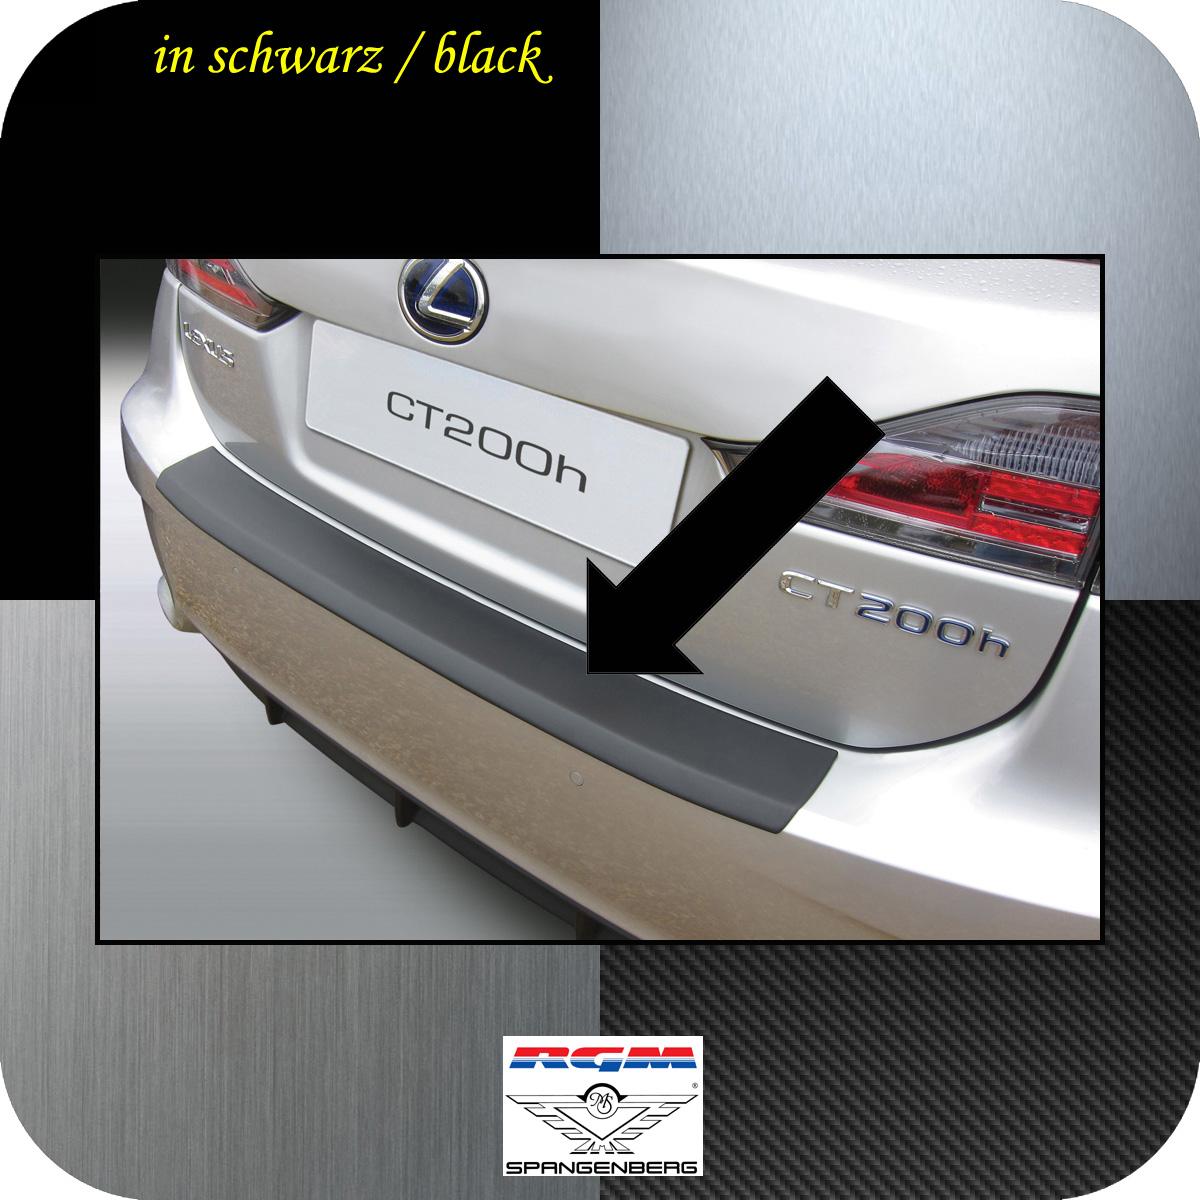 Ladekantenschutz schwarz Lexus CT 200h 5-Türer ab facelift 2014- 3500728